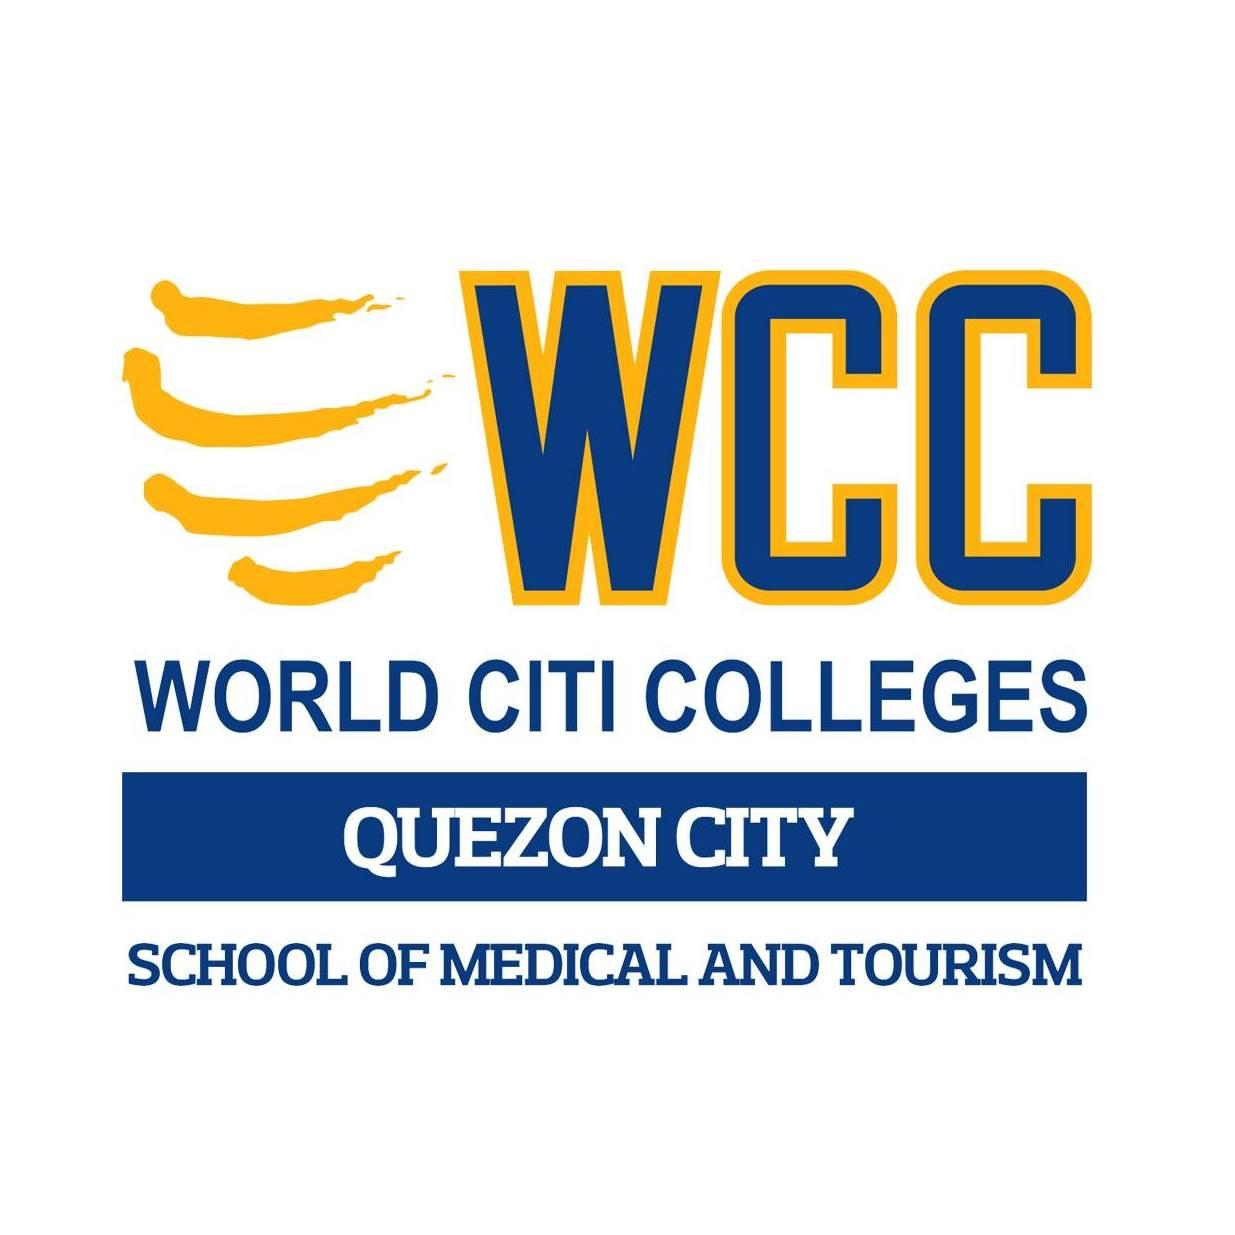 World Citi Colleges Quezon City Logo